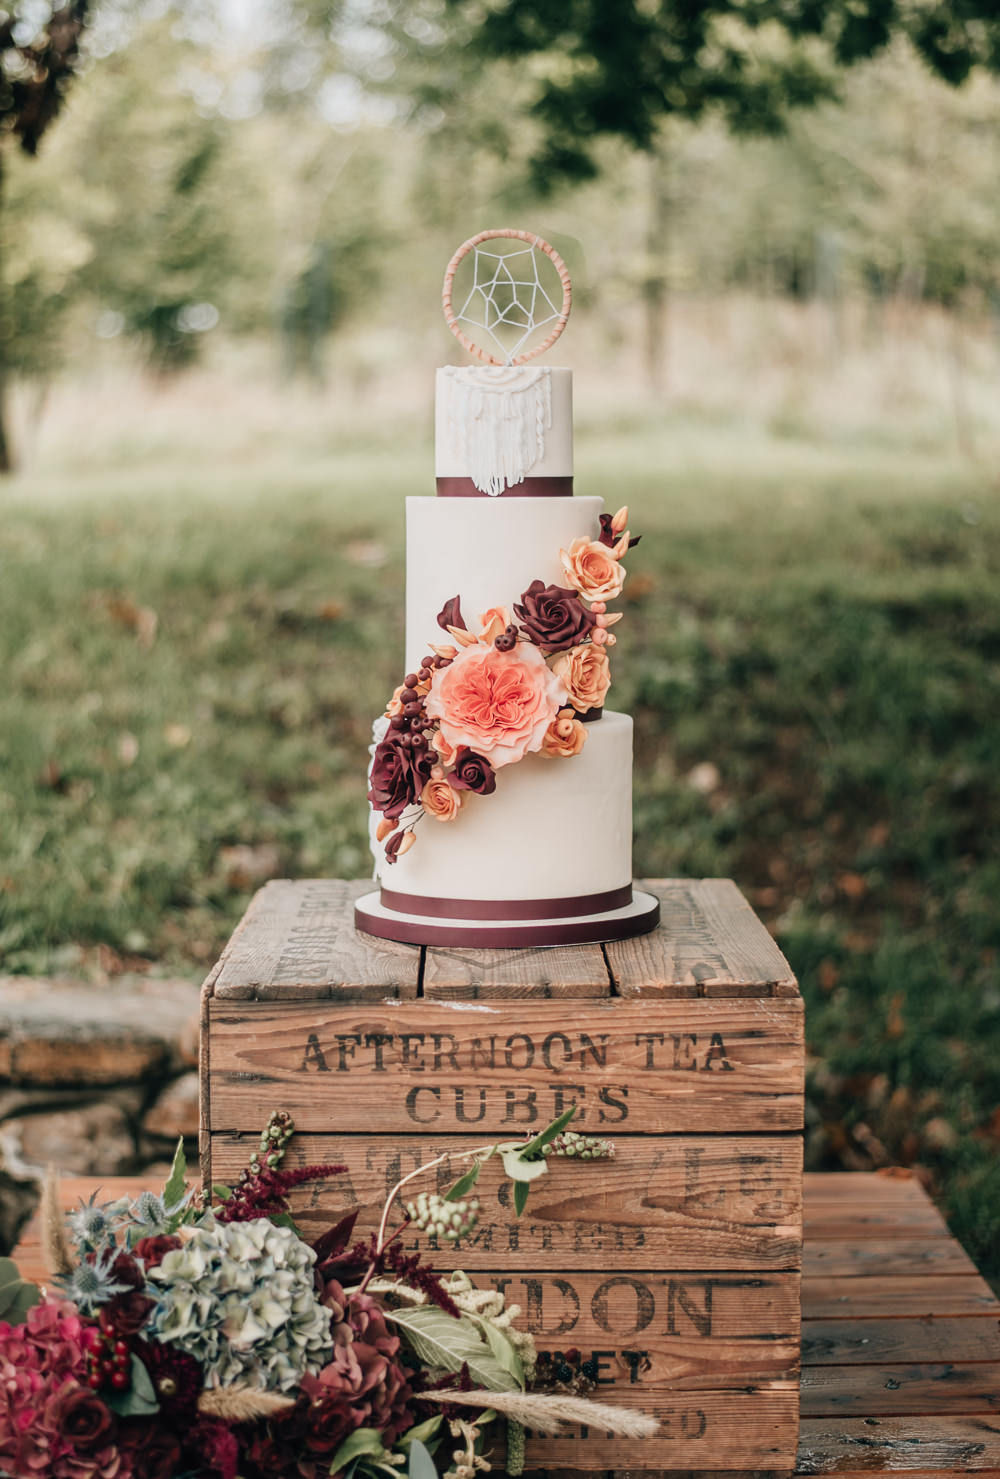 Iced Cake Sugar Flowers Dream Catcher Macrame Burgundy Orange Wooden Crates Stand Eco Friendly Wedding Inspiration Sarah Jayne Photography